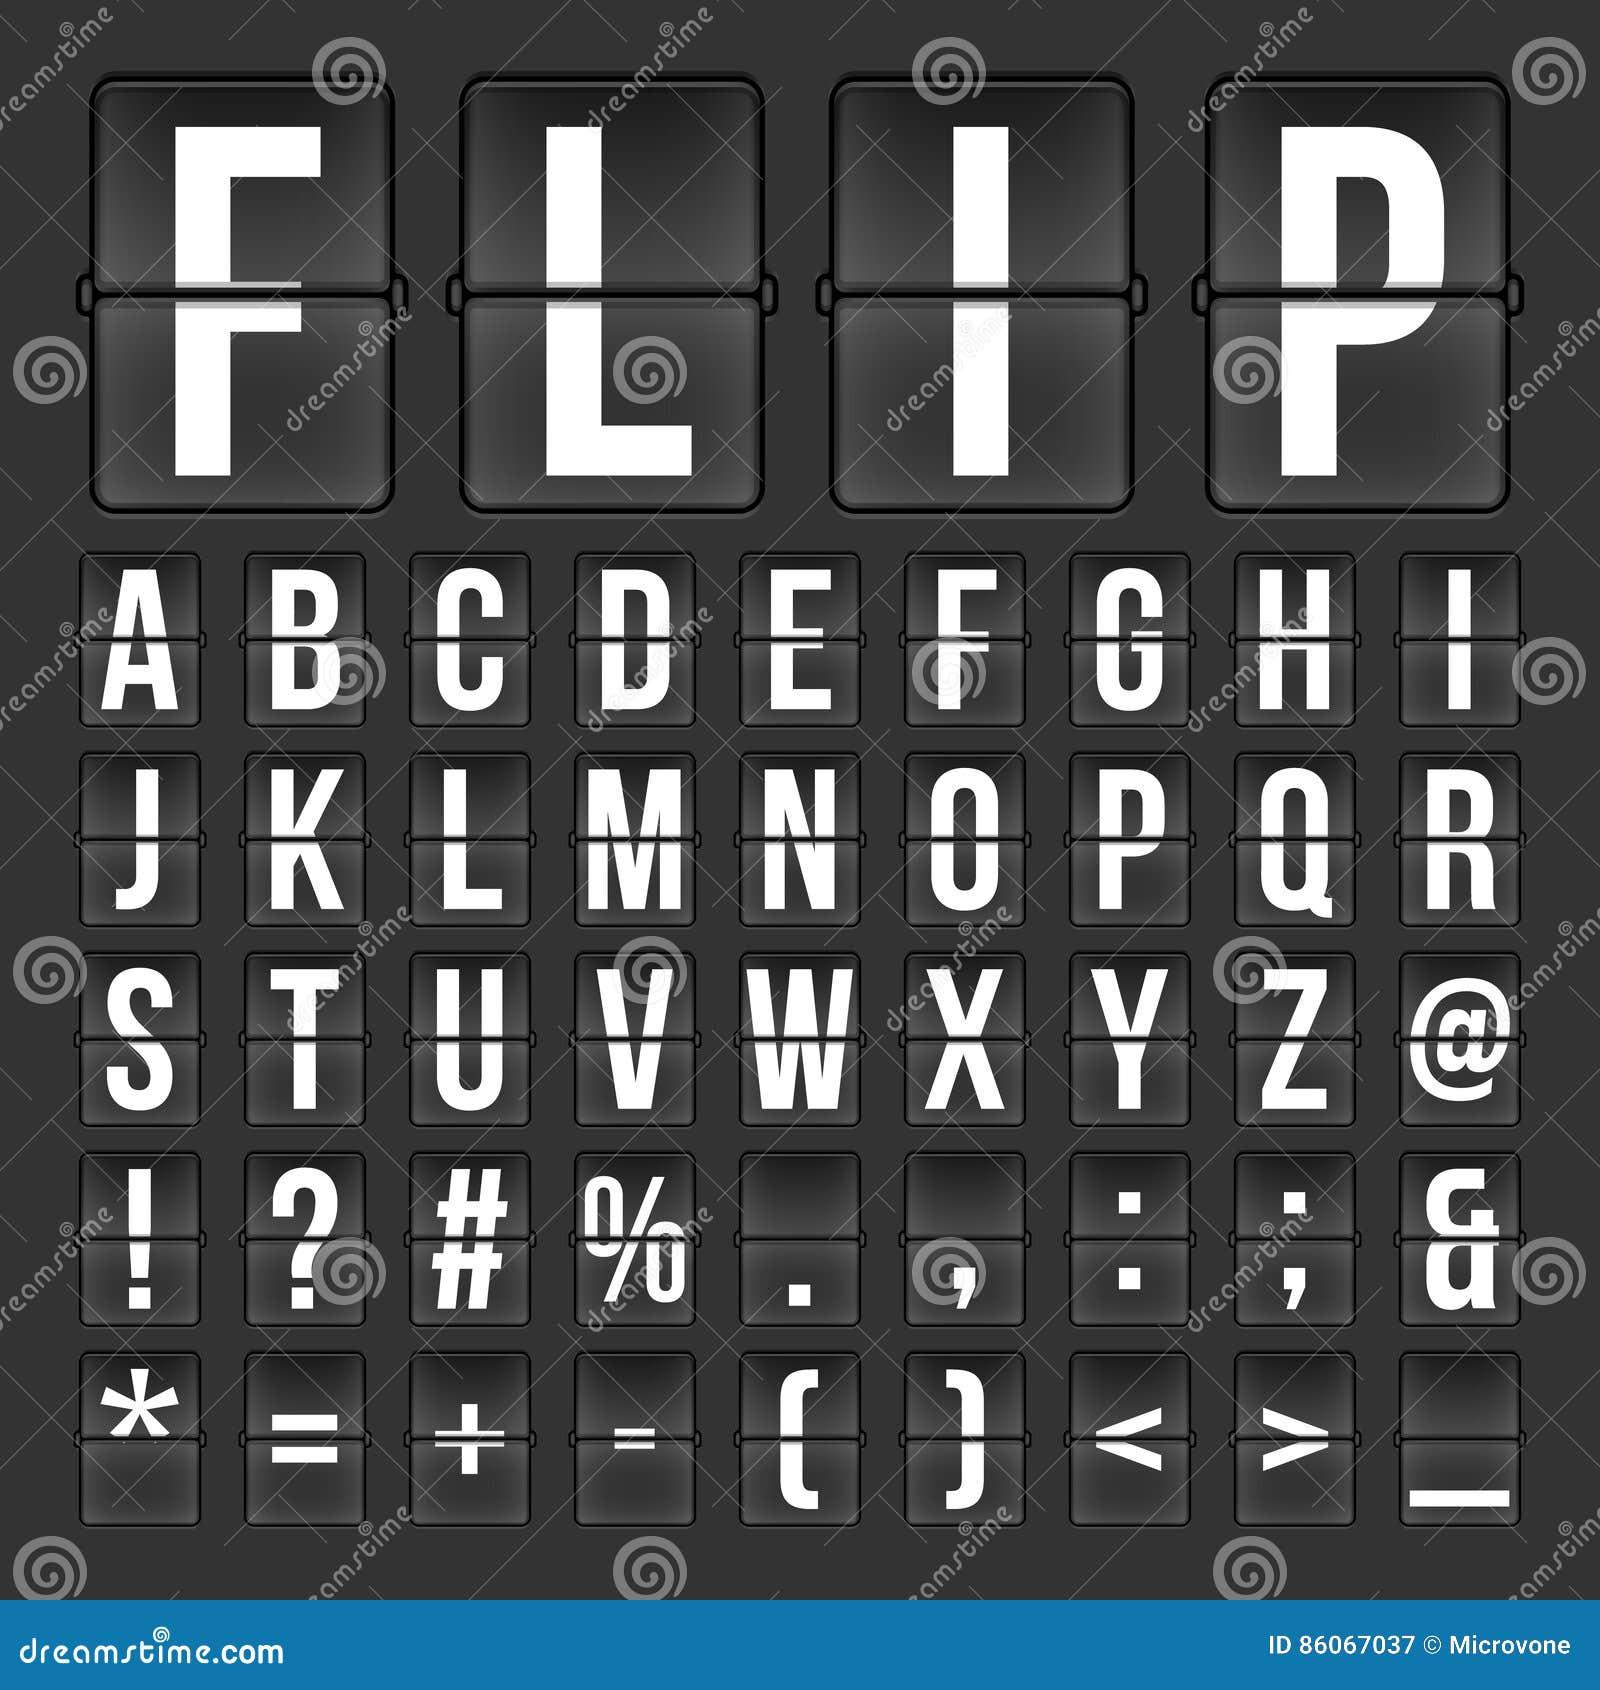 digital numbers and symbols flip countdown digital calendar clock numbers letters vector alphabet font airport